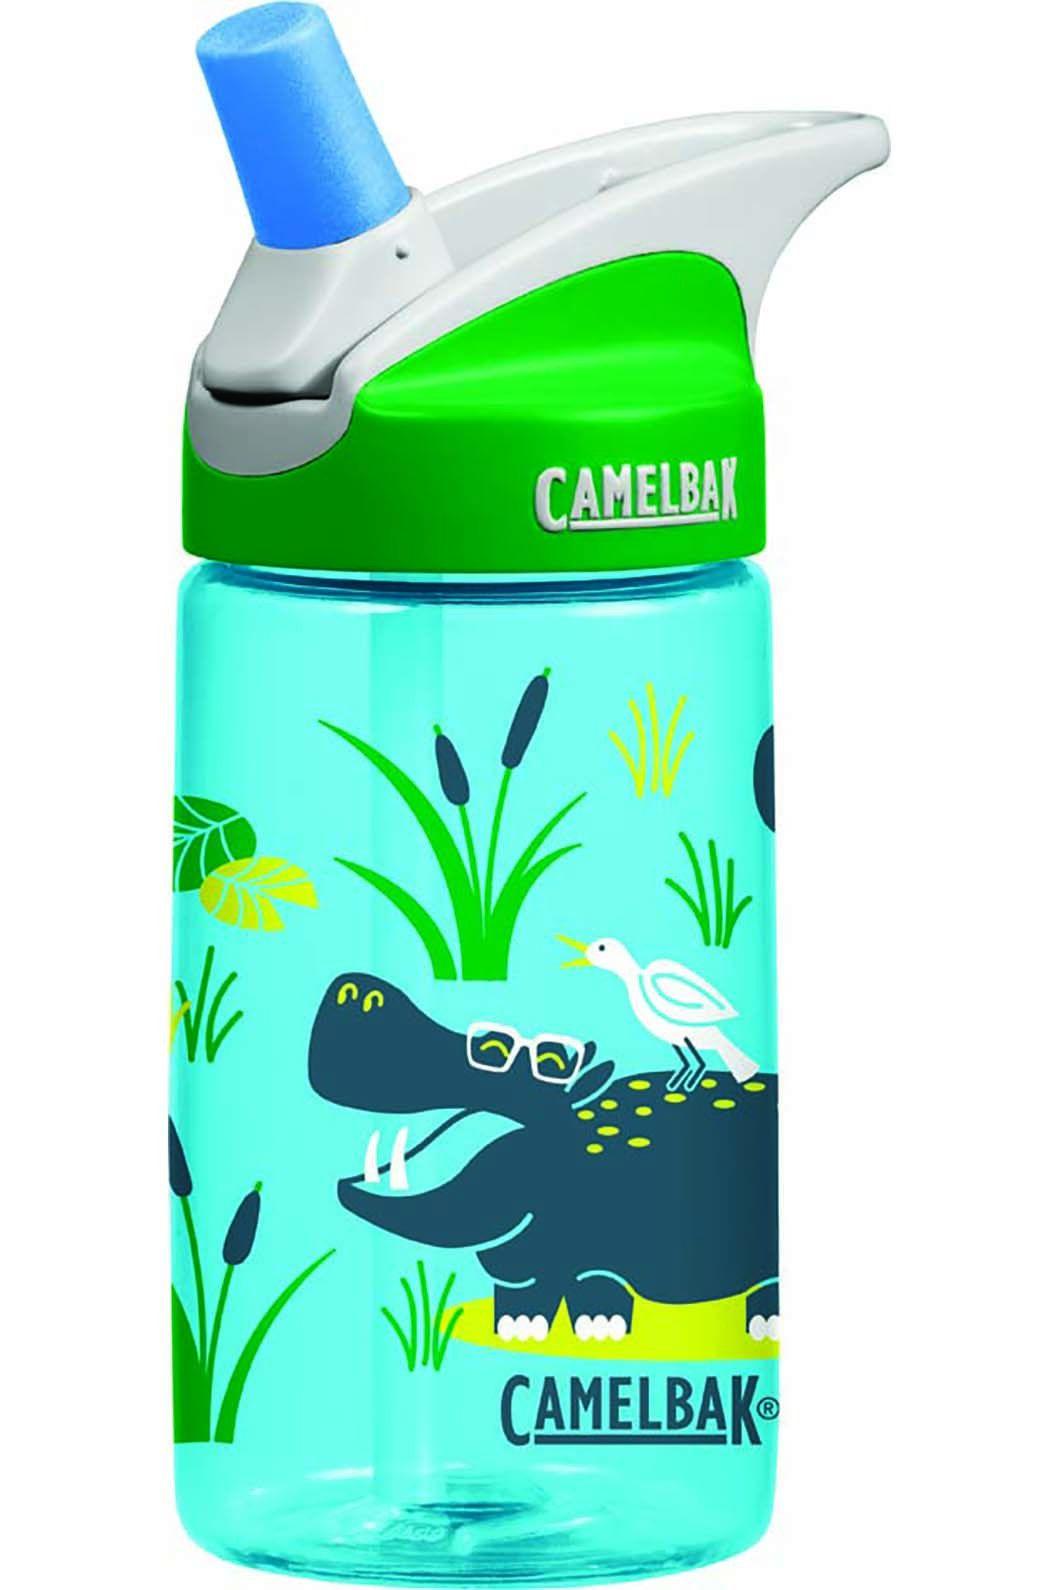 CamelBak Kids' Eddy Drink Bottle Hippos, None, hi-res